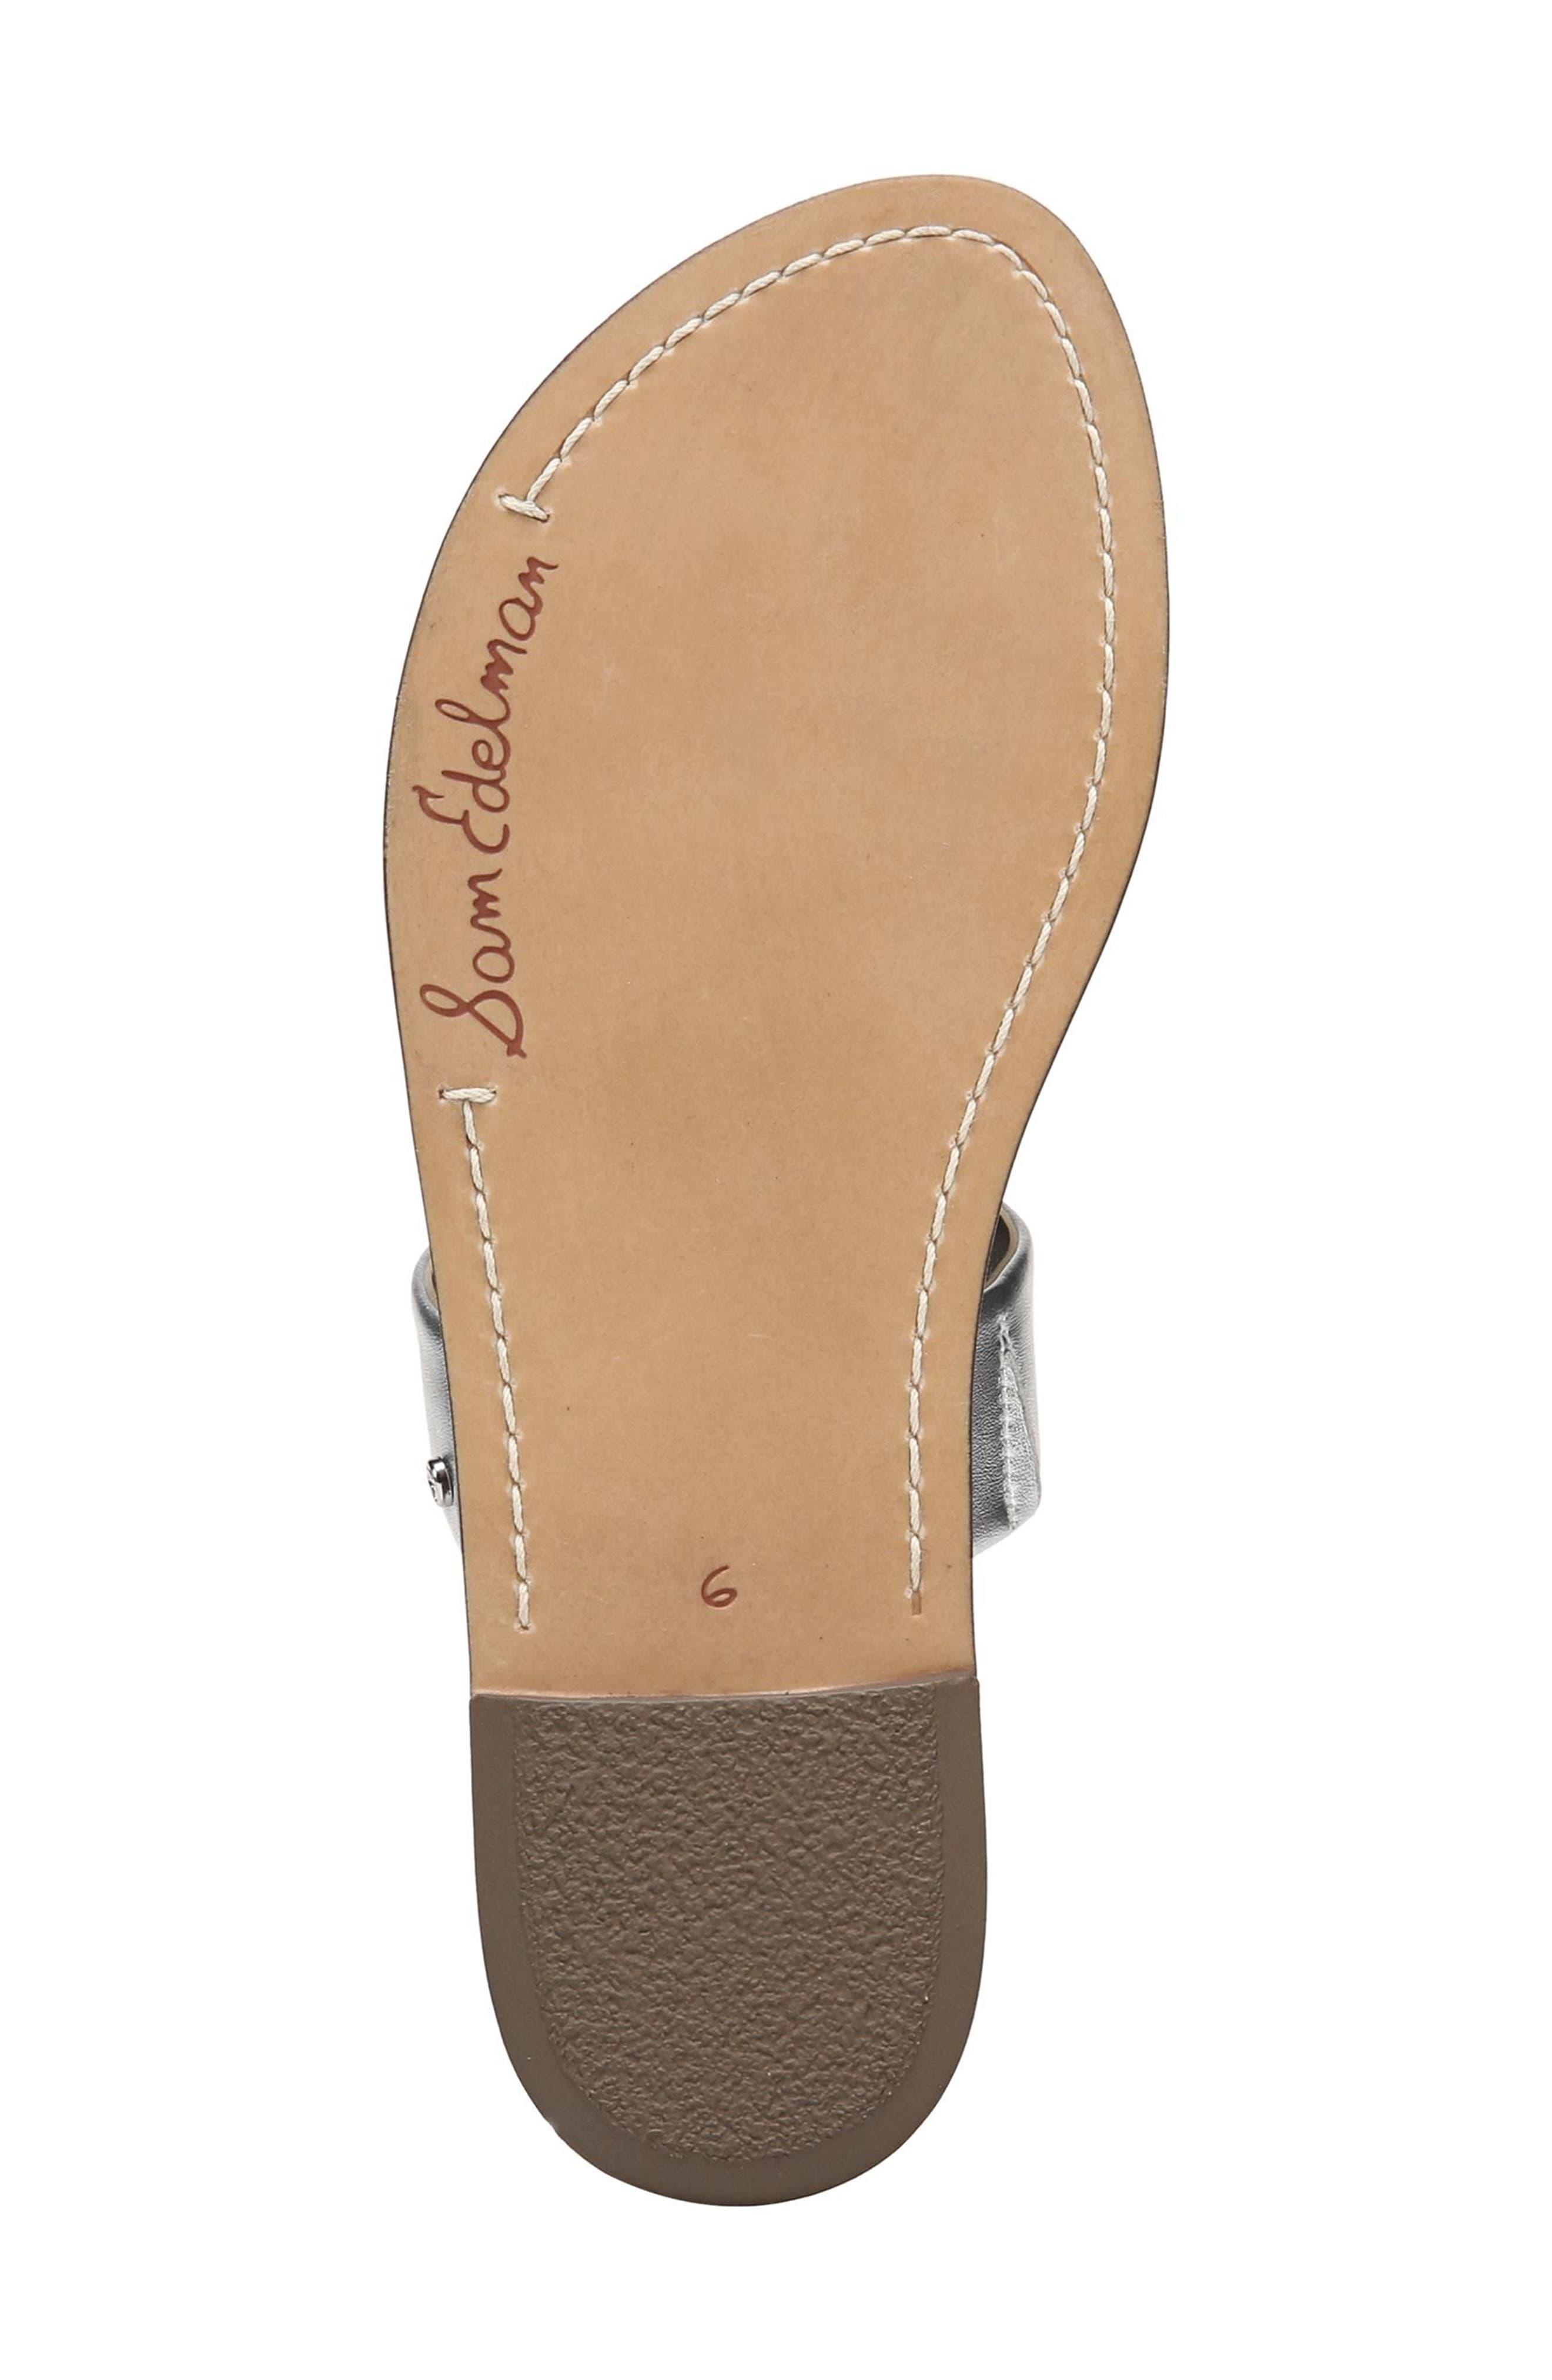 Gala Two Strap Slide Sandal,                             Alternate thumbnail 6, color,                             Silver Leather